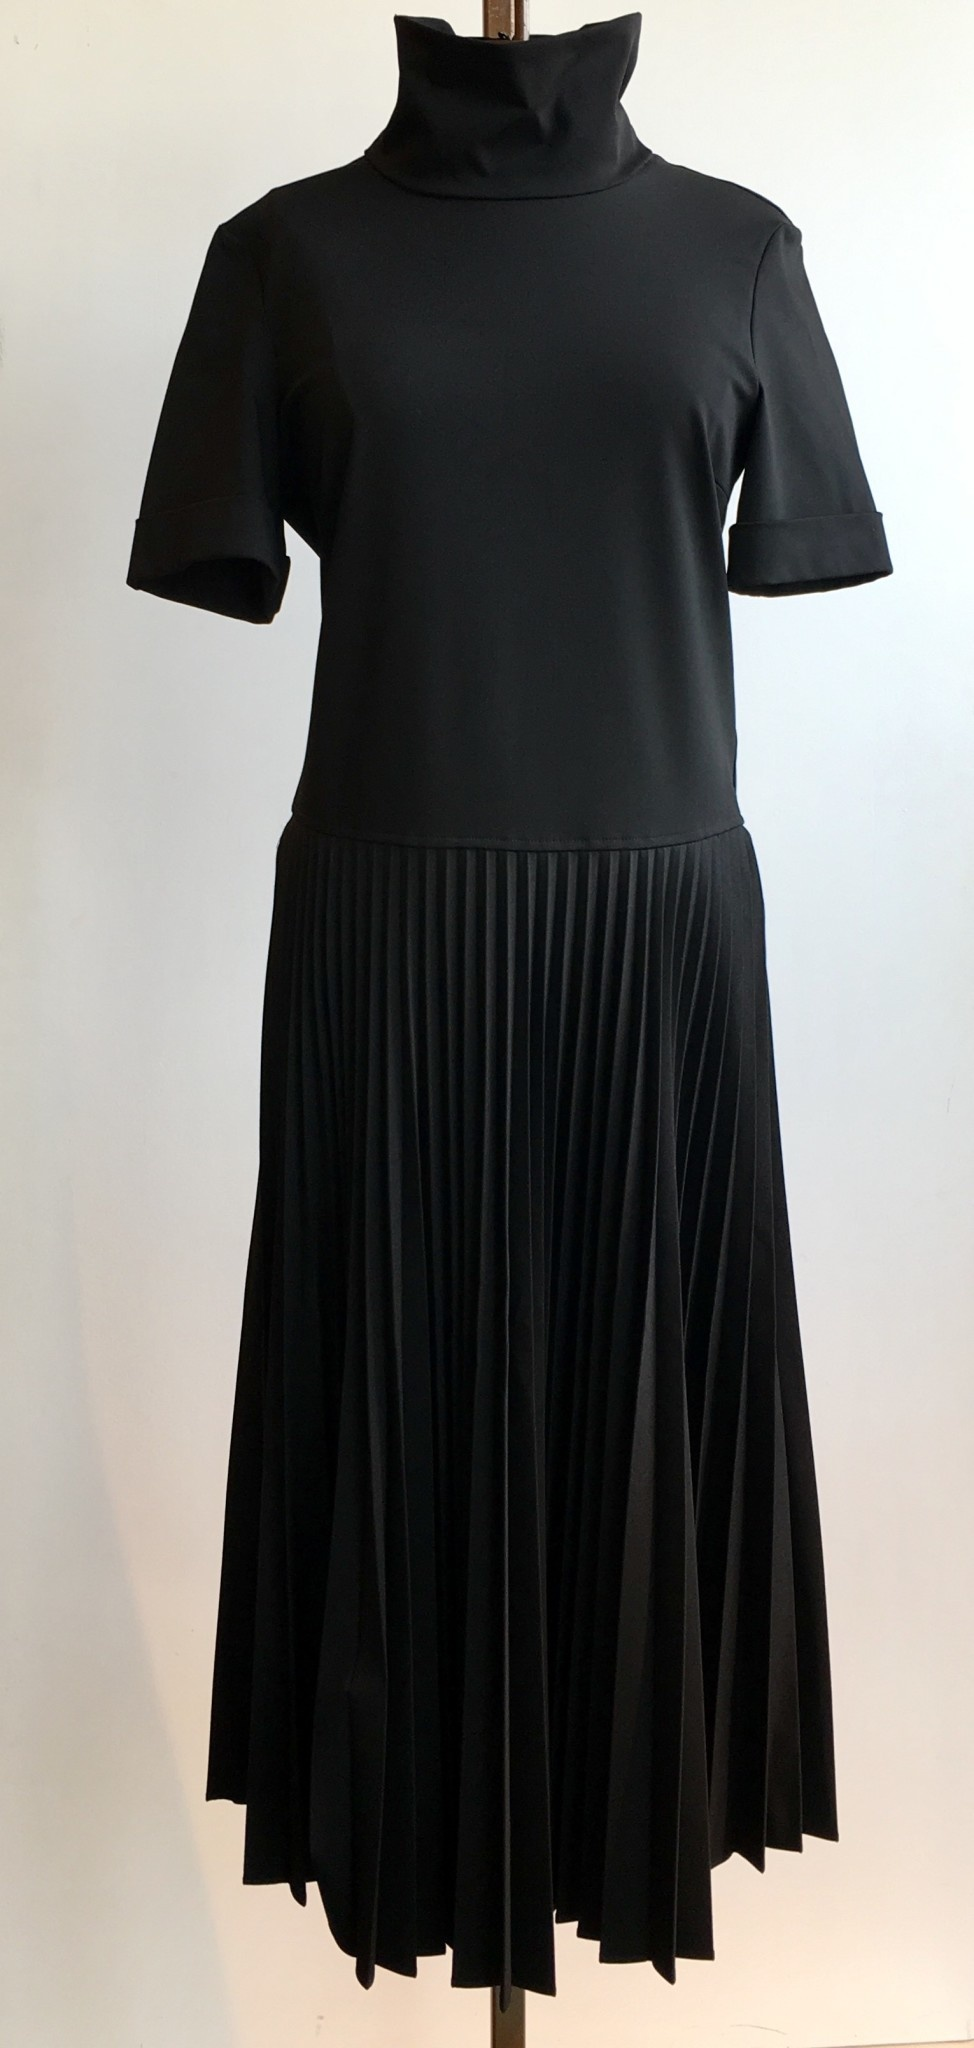 Liviana Conti Pleated Skirt Dress